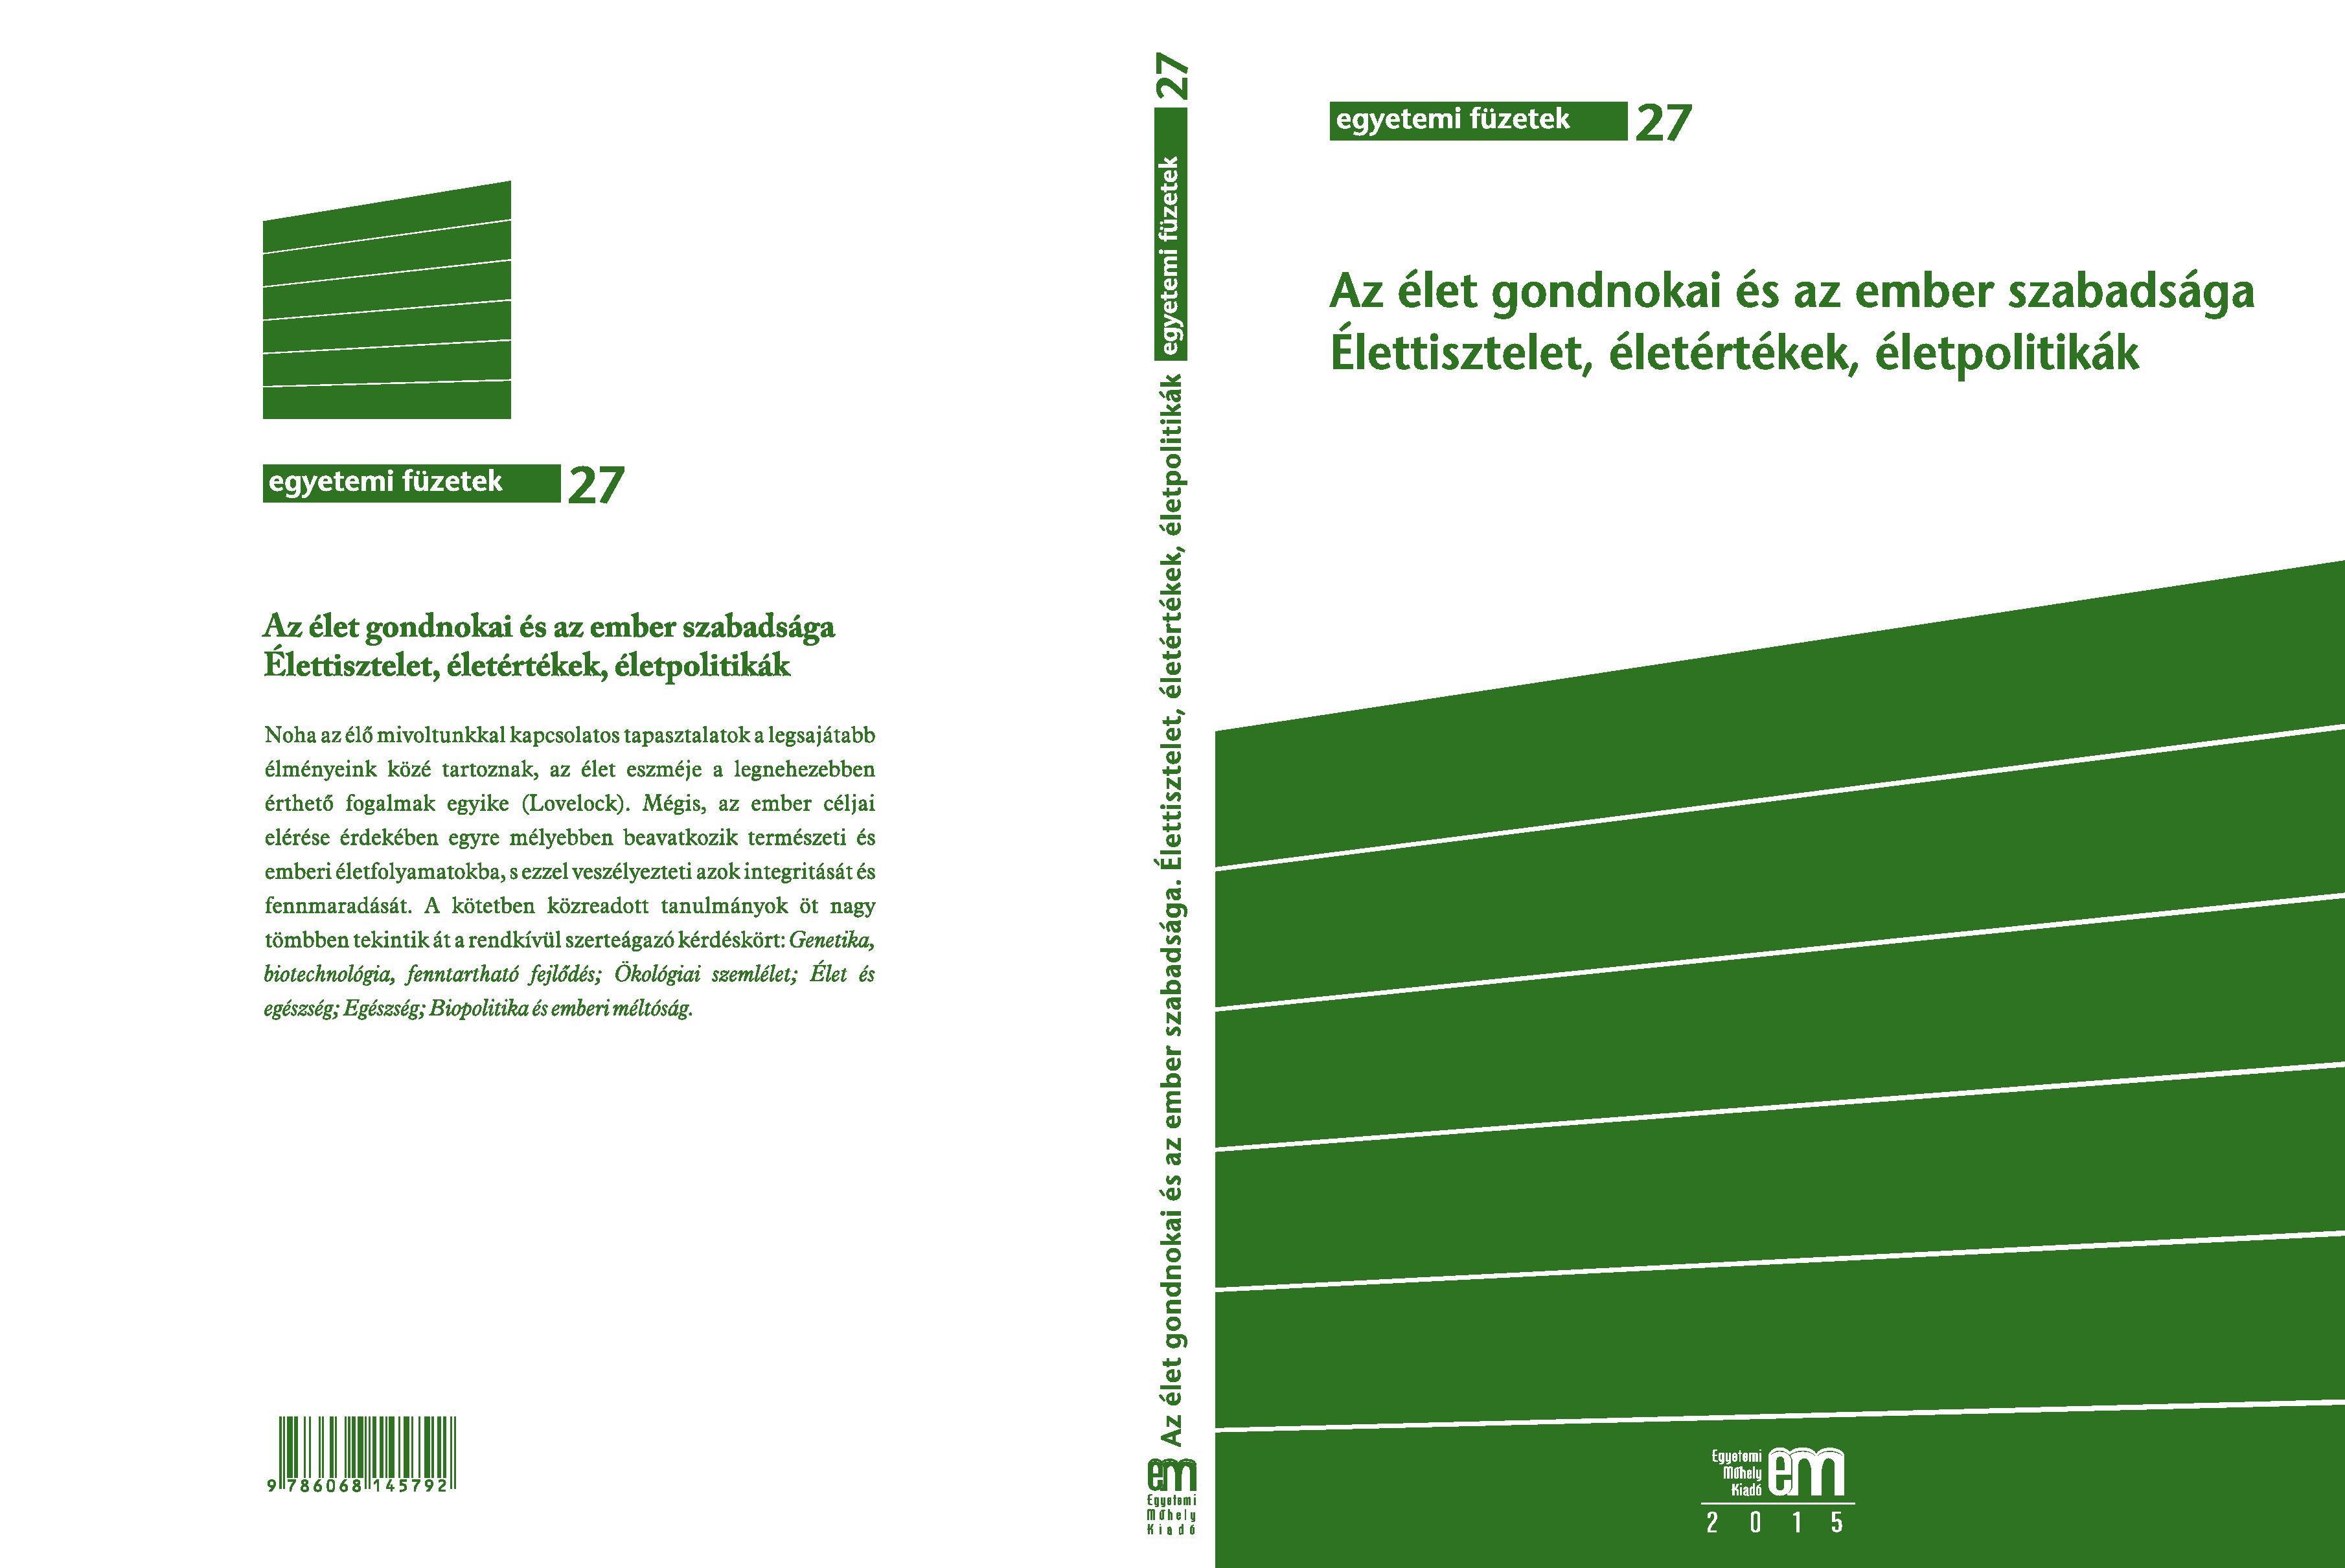 elet gondnokai BT-v2-page-001